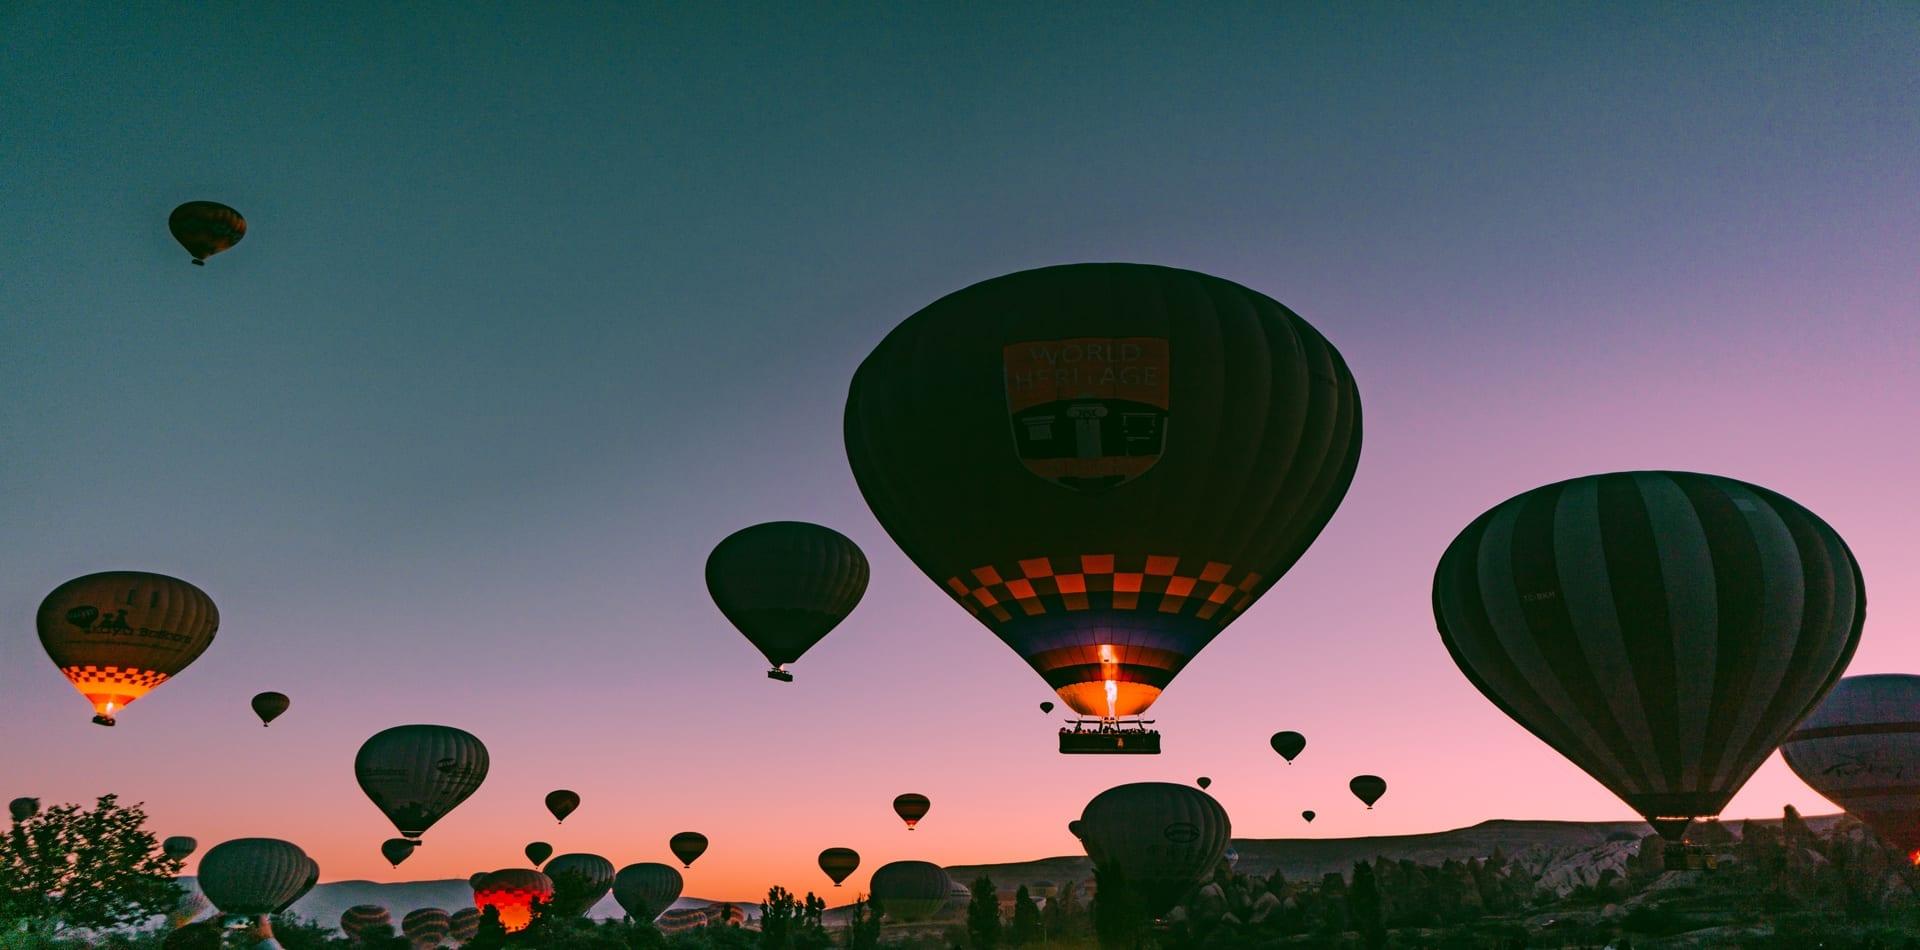 Hero Turkey Cappadocia Balloons